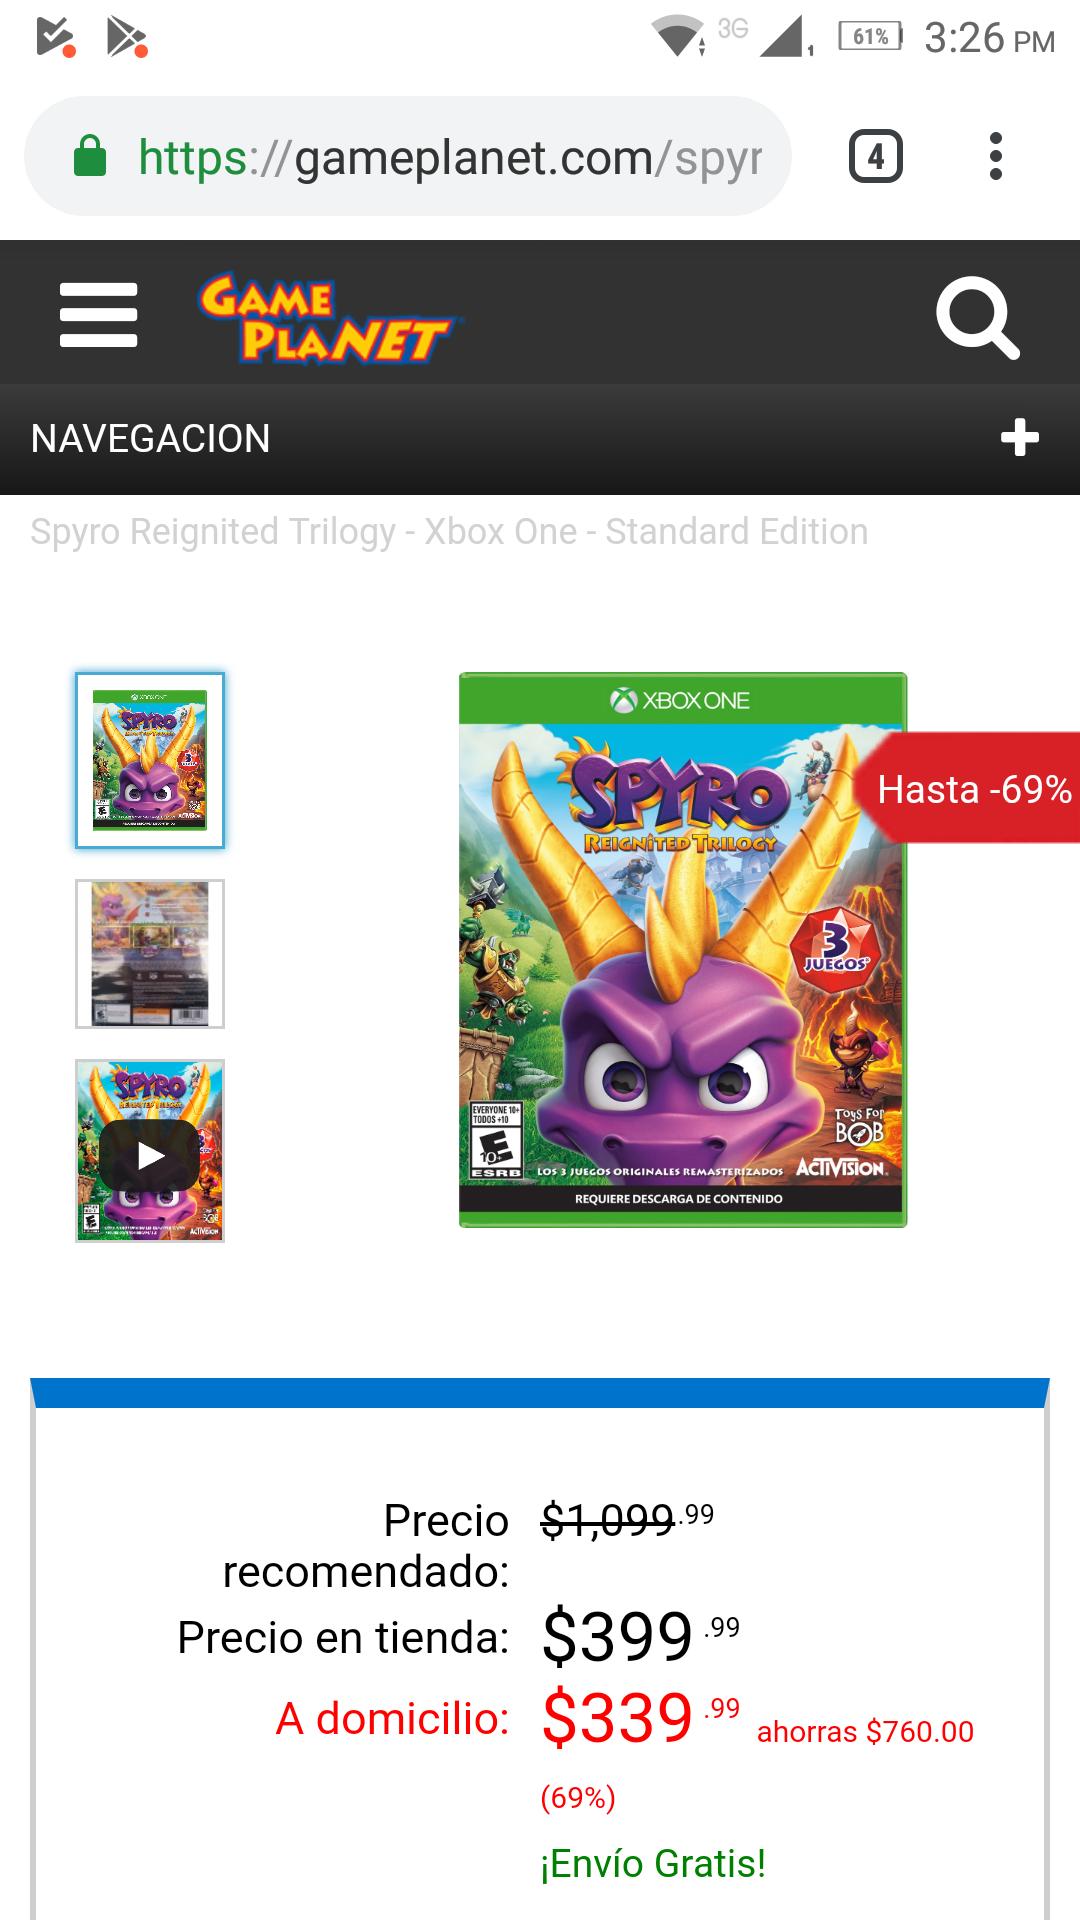 Gameplanet Spyro solo en Xbox one